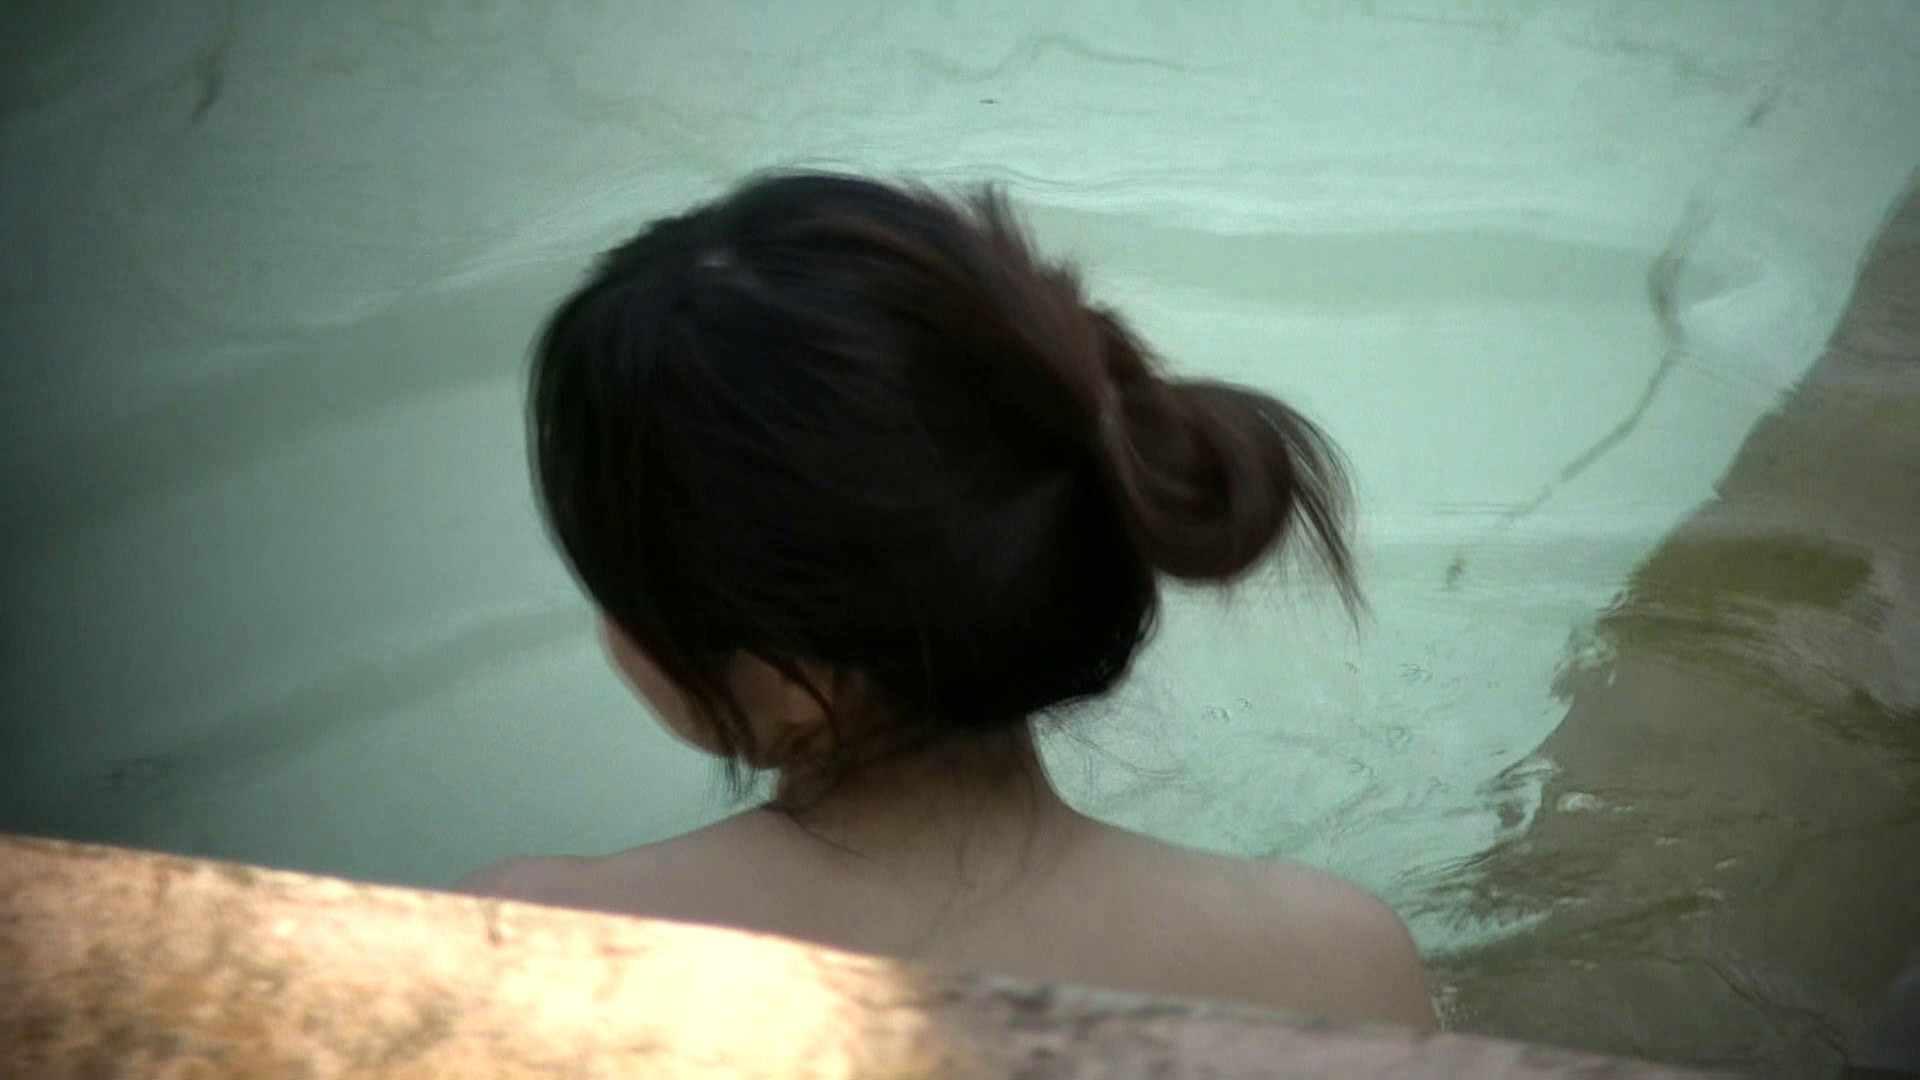 Aquaな露天風呂Vol.652 美しいOLの裸体 SEX無修正画像 79pic 20